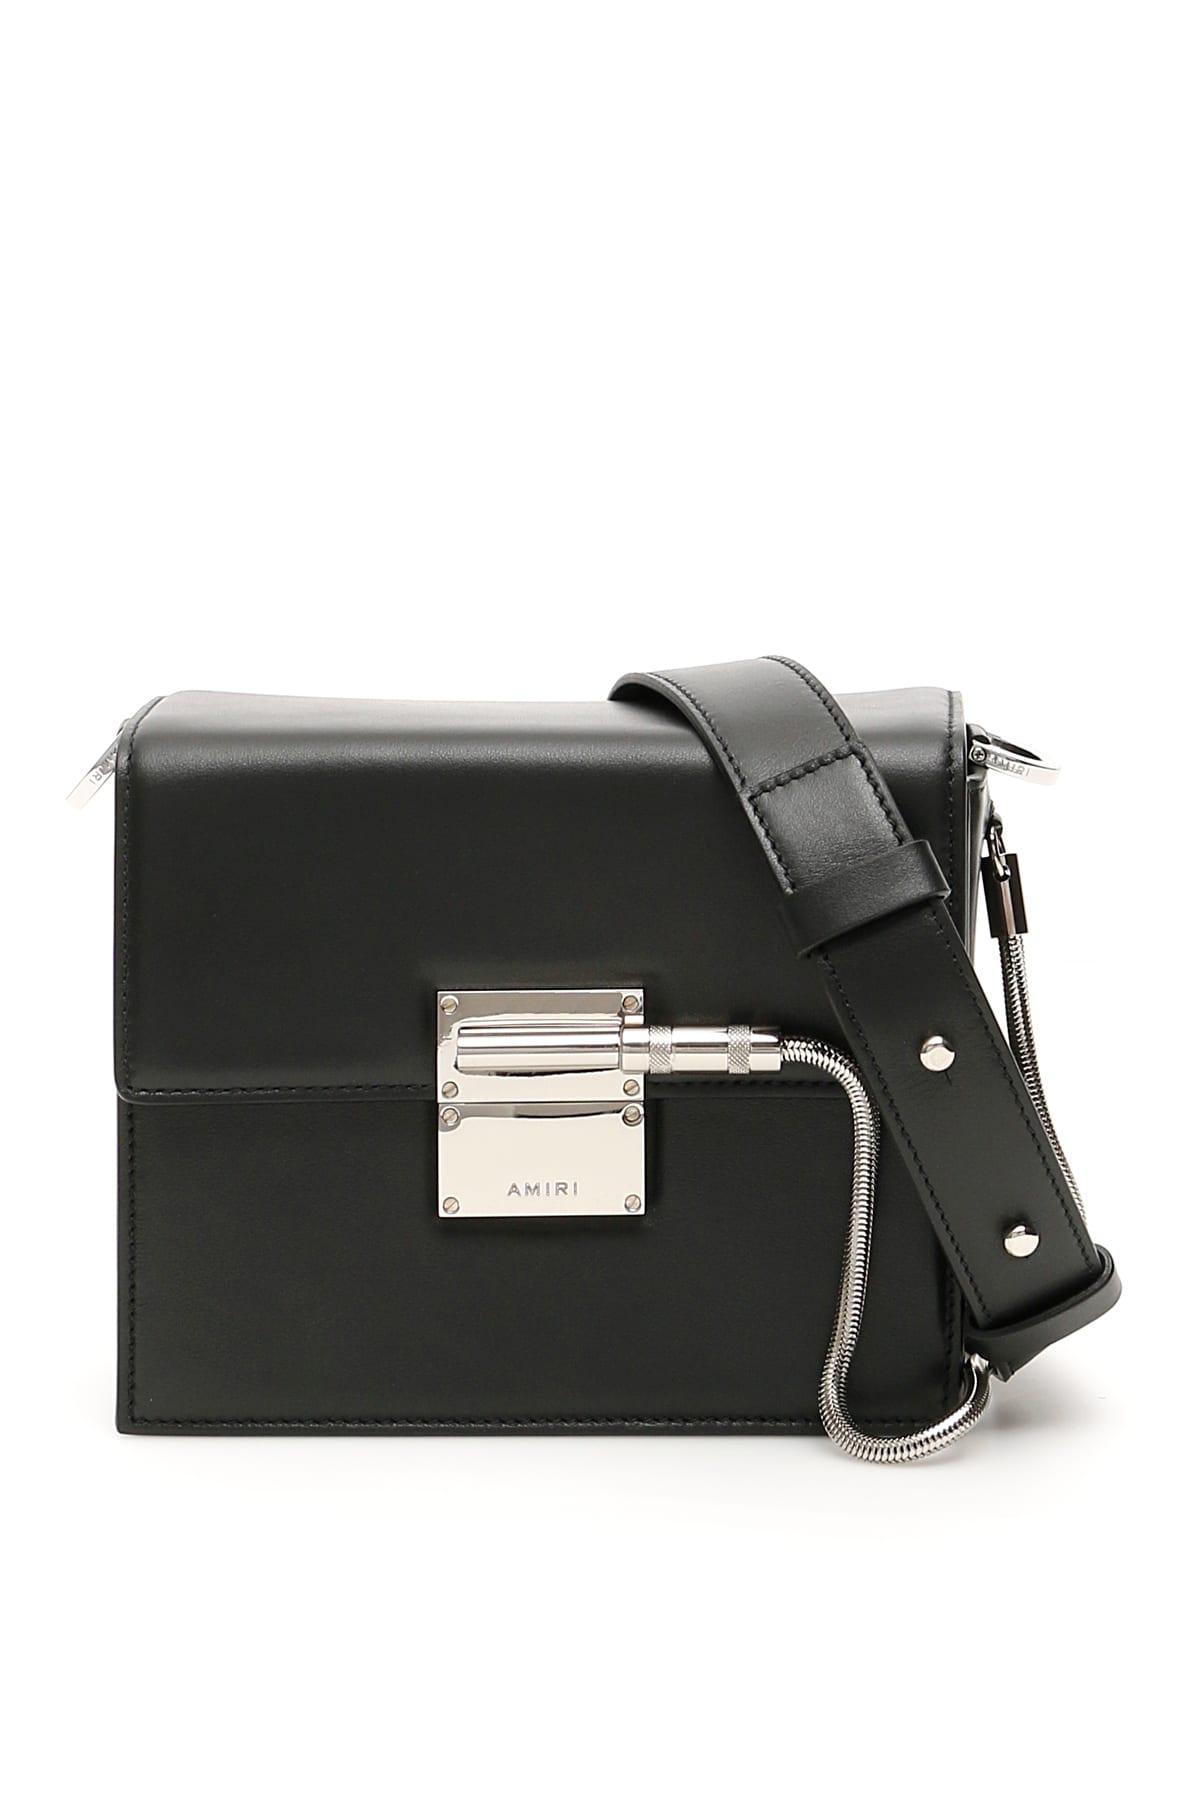 AMIRI Amp Bag